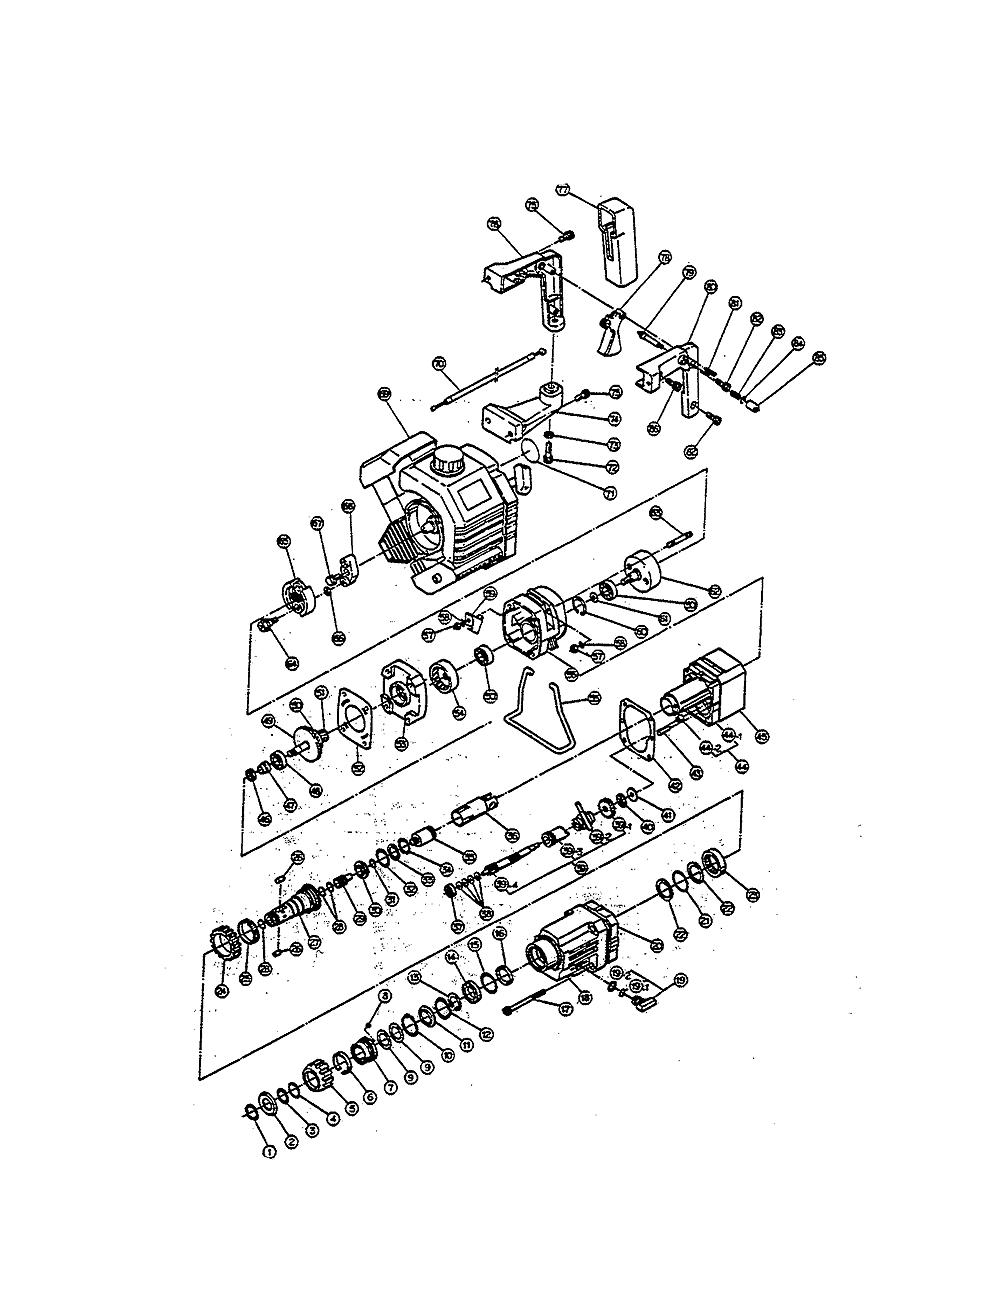 buy ryobi er160 replacement tool parts